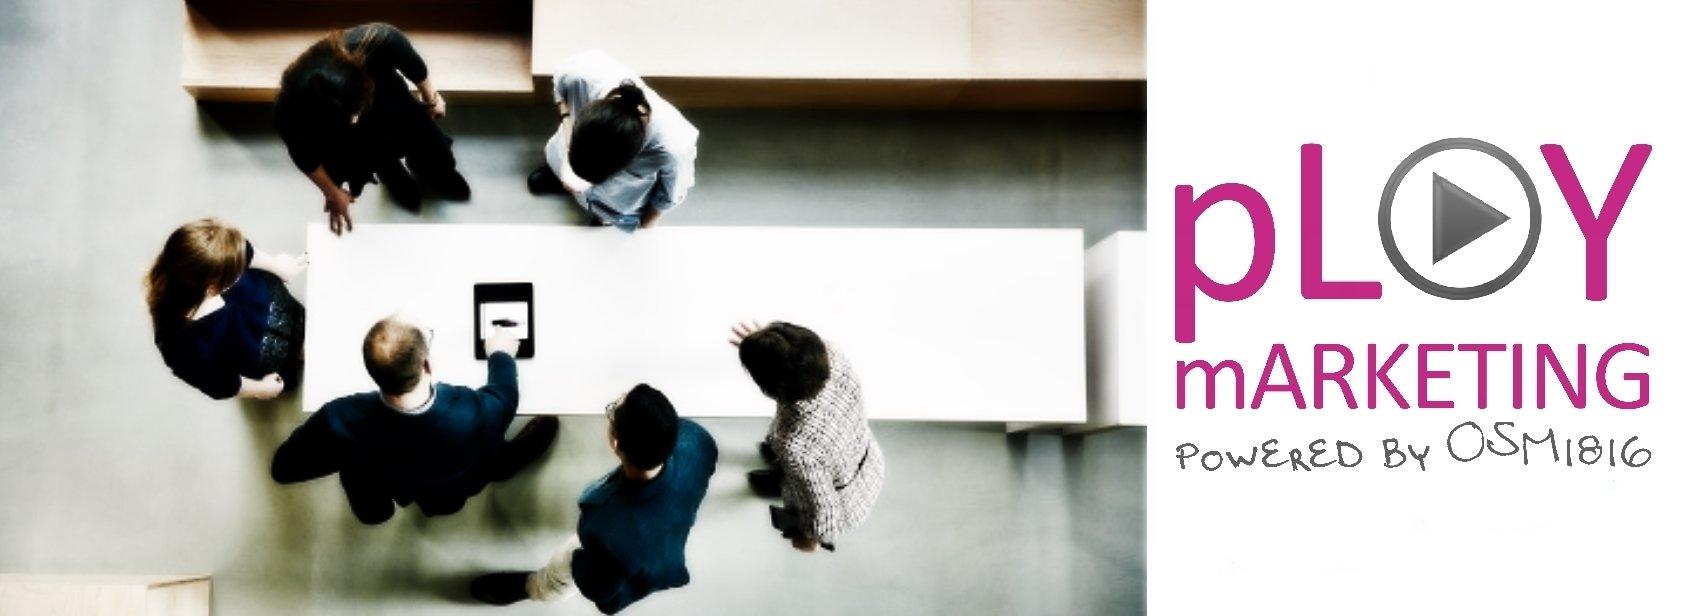 4 strategie per gestire gli stakeholder